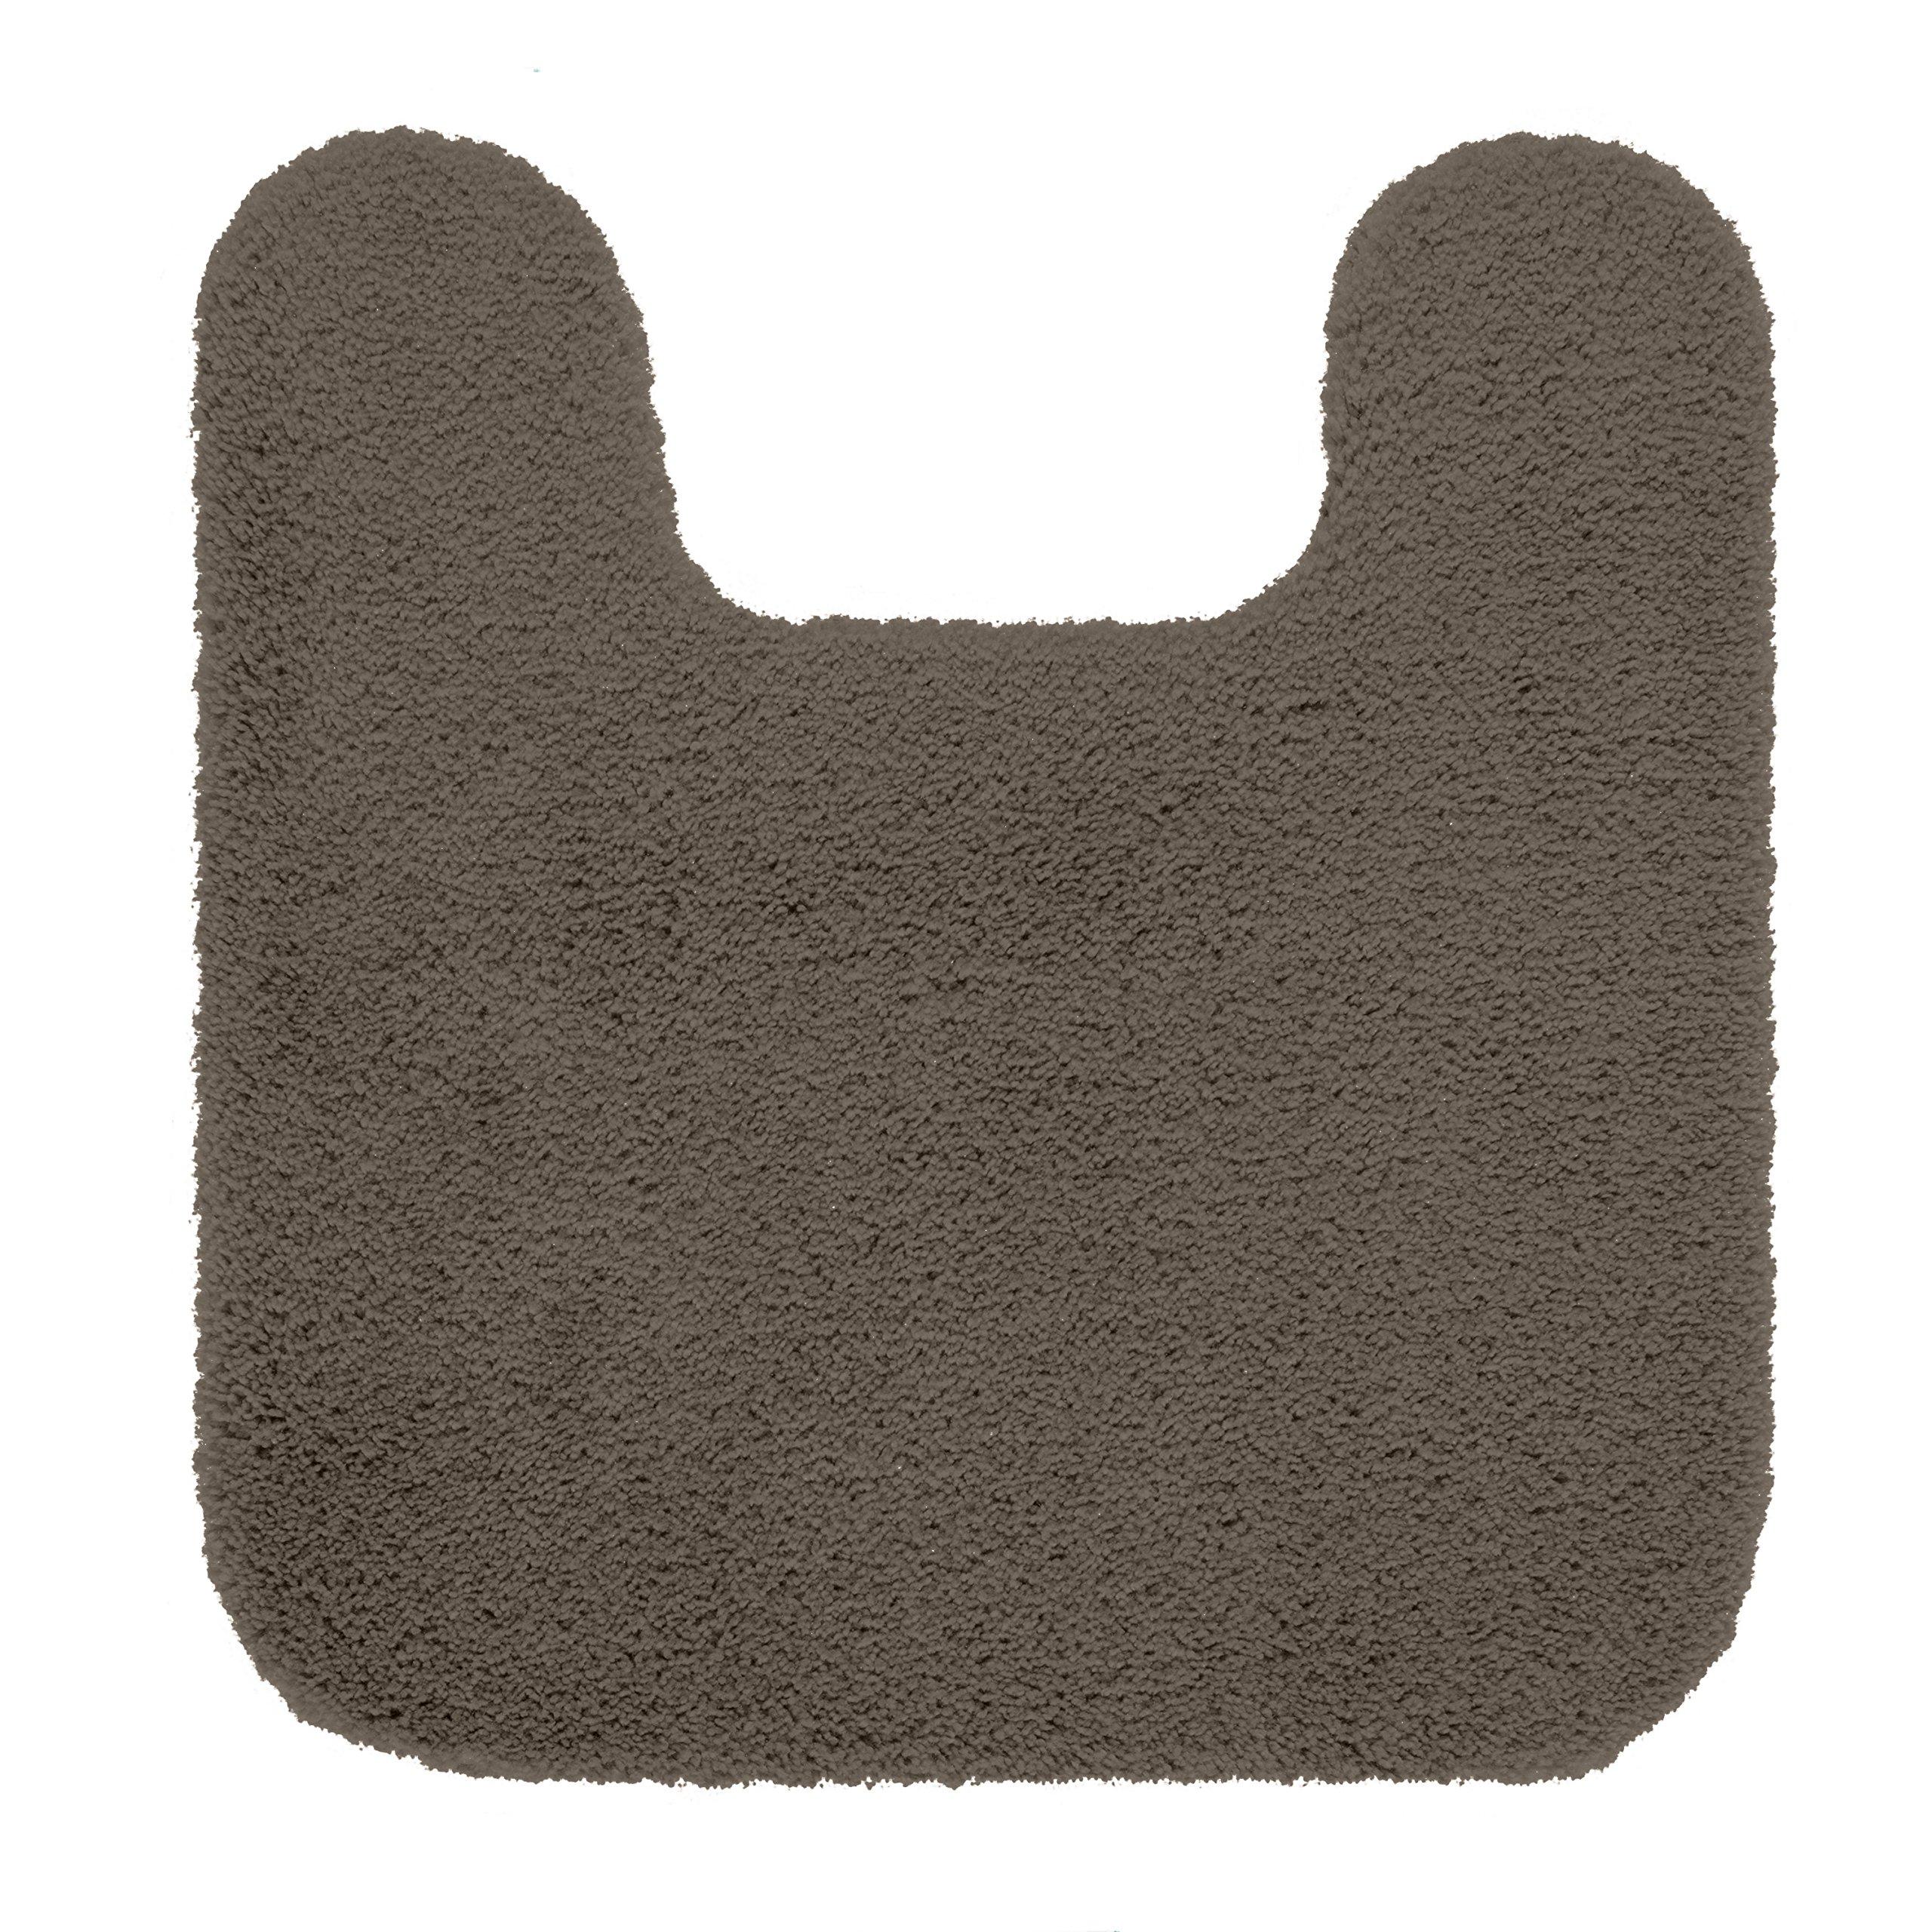 Maples Rugs Bathroom Rugs - Cloud Bath 20'' x 21.5'' Contour Non Slip Toilet Rug [Made in USA] Machine Washable Soft Bath Mat, Mocha Latte